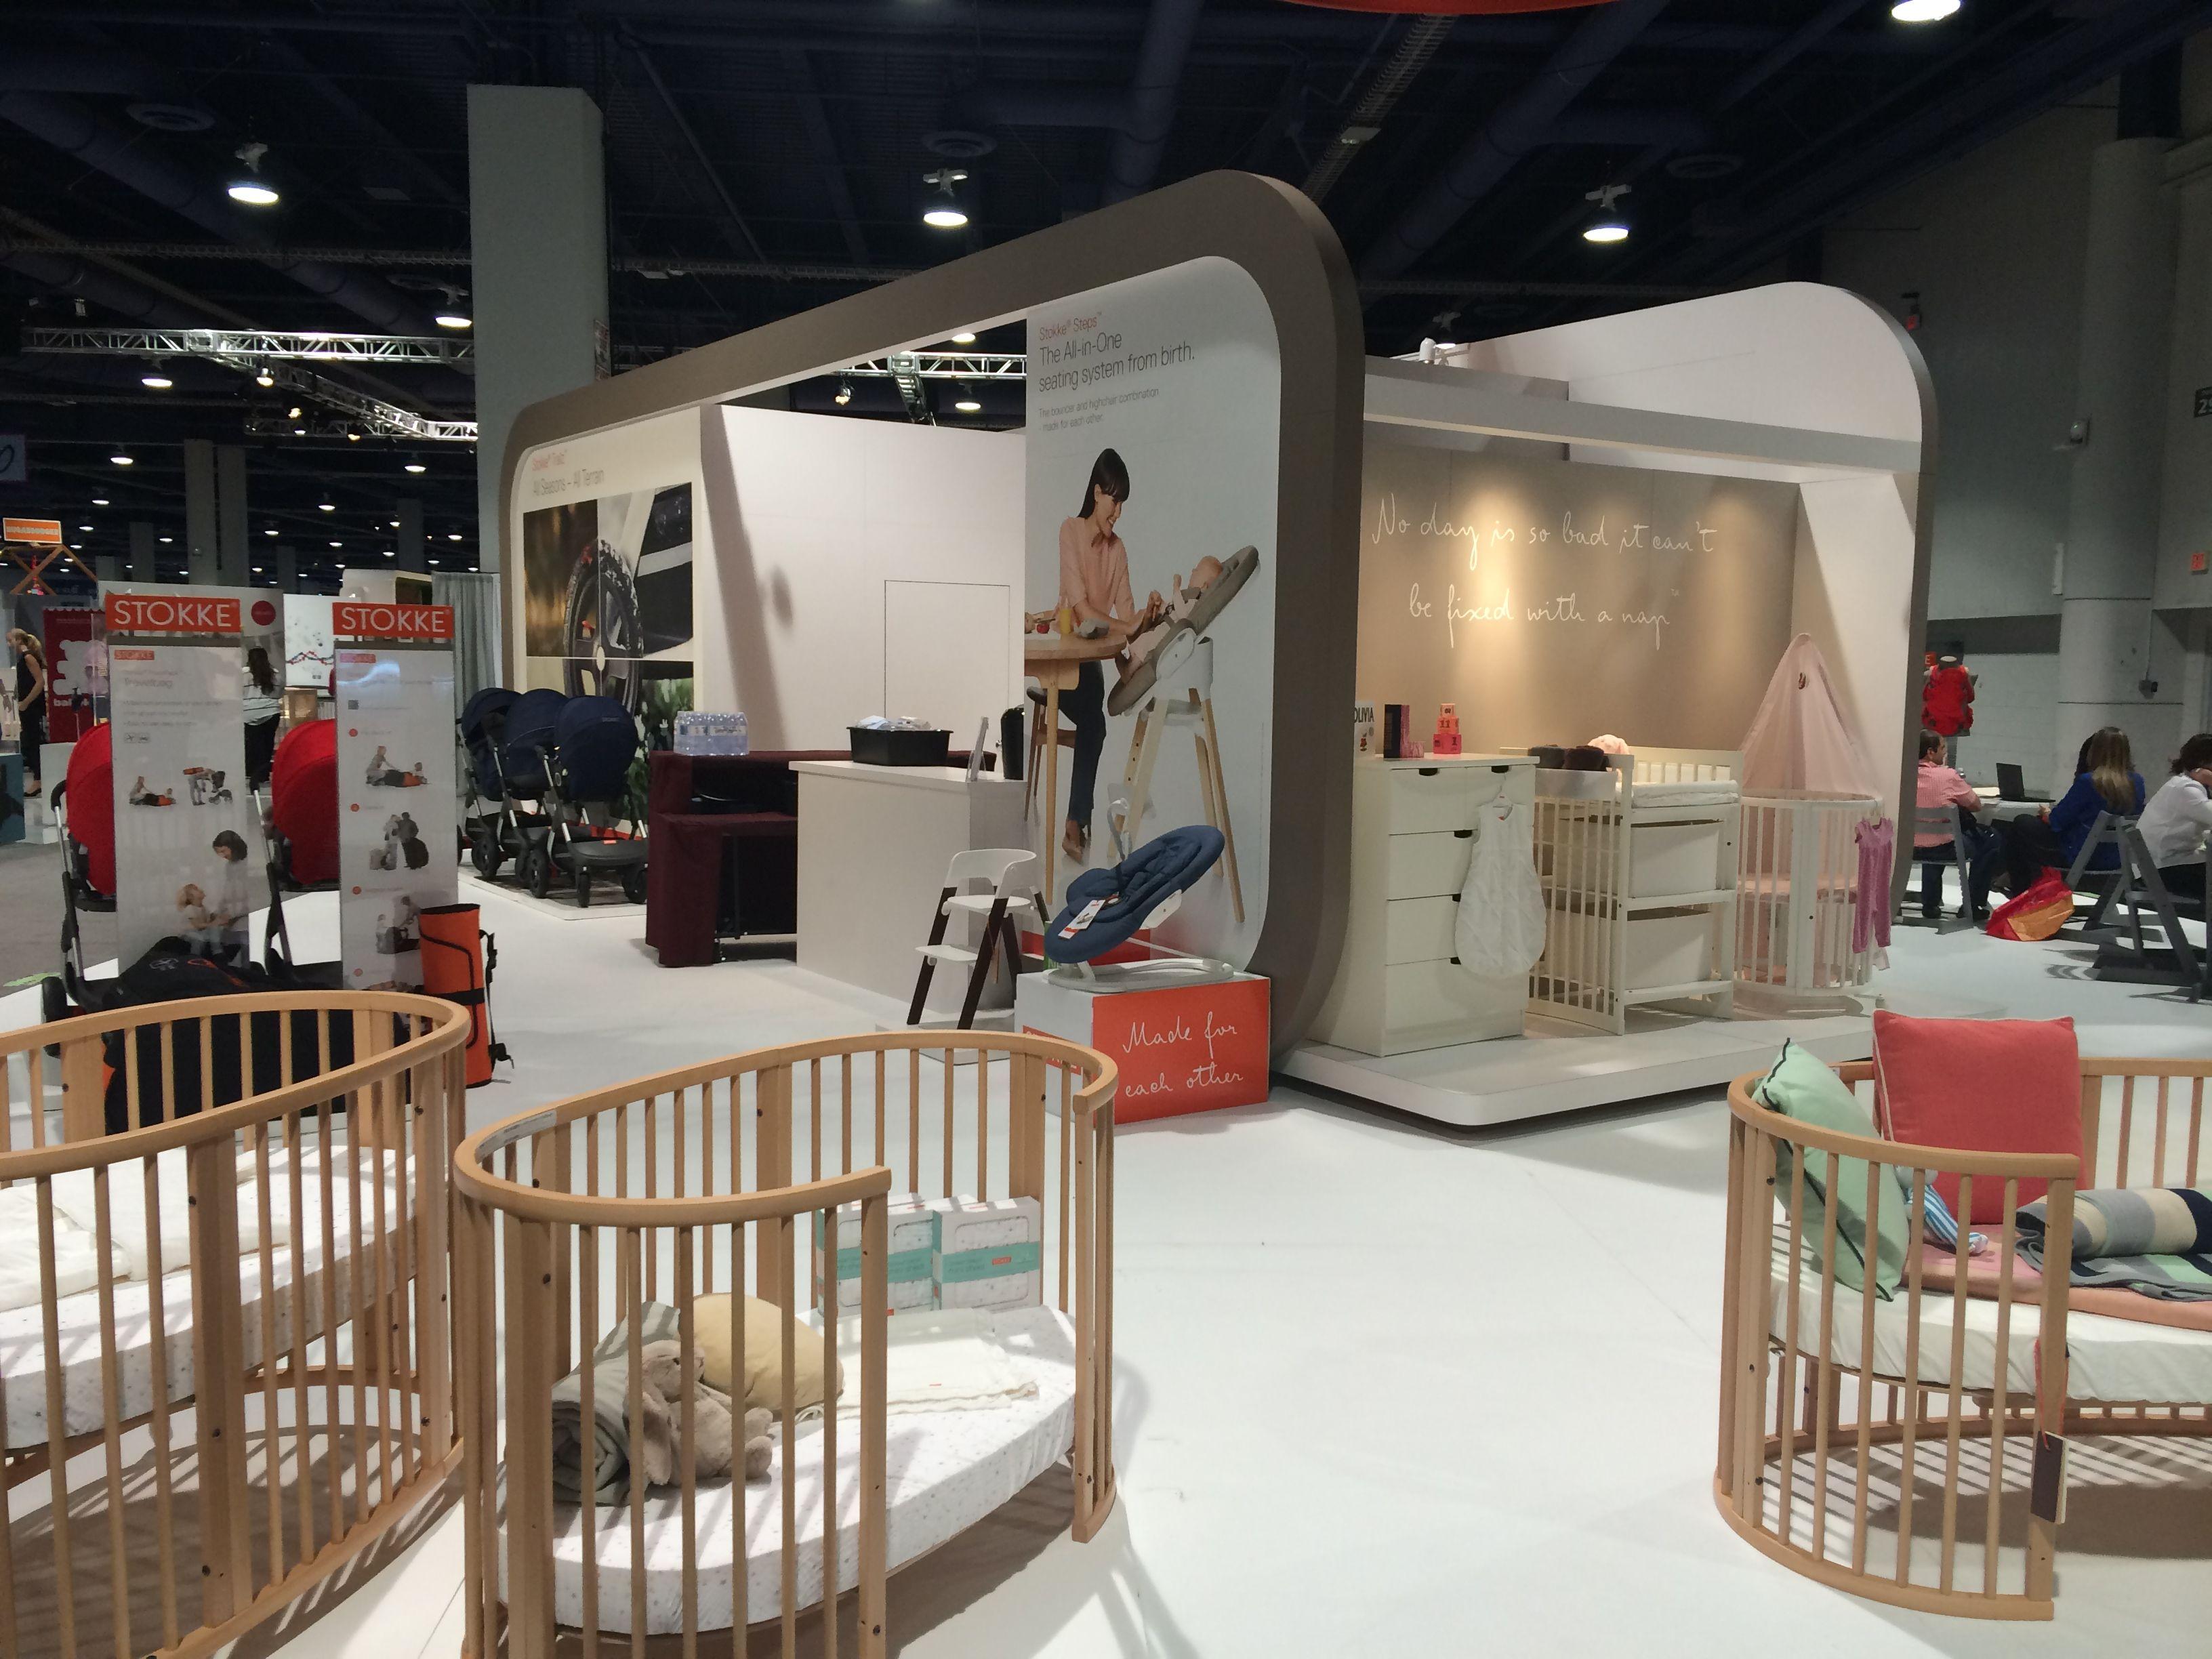 Modern Furniture Expo 1108 best expandable stokke sleepi crib/bed images on pinterest